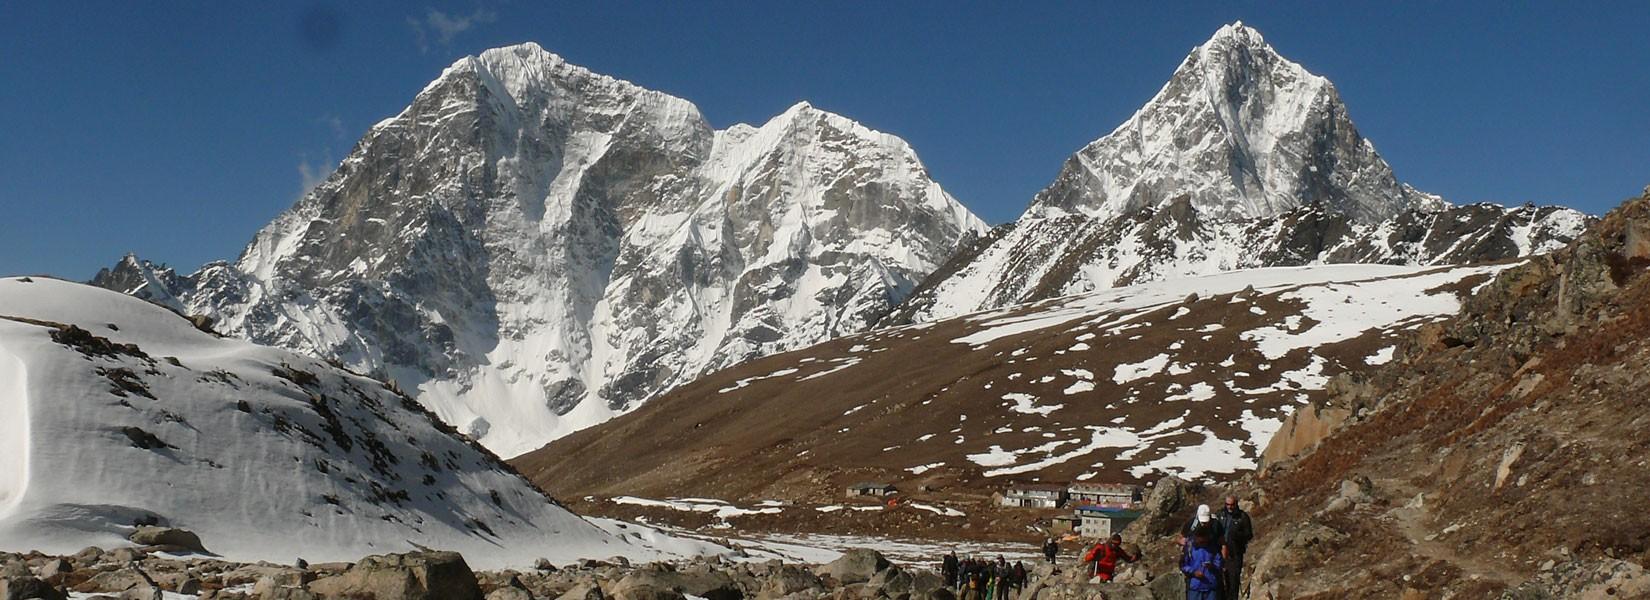 Lobuche Peak, Everest Base Camp Trek via Gokyo Cho La Pass